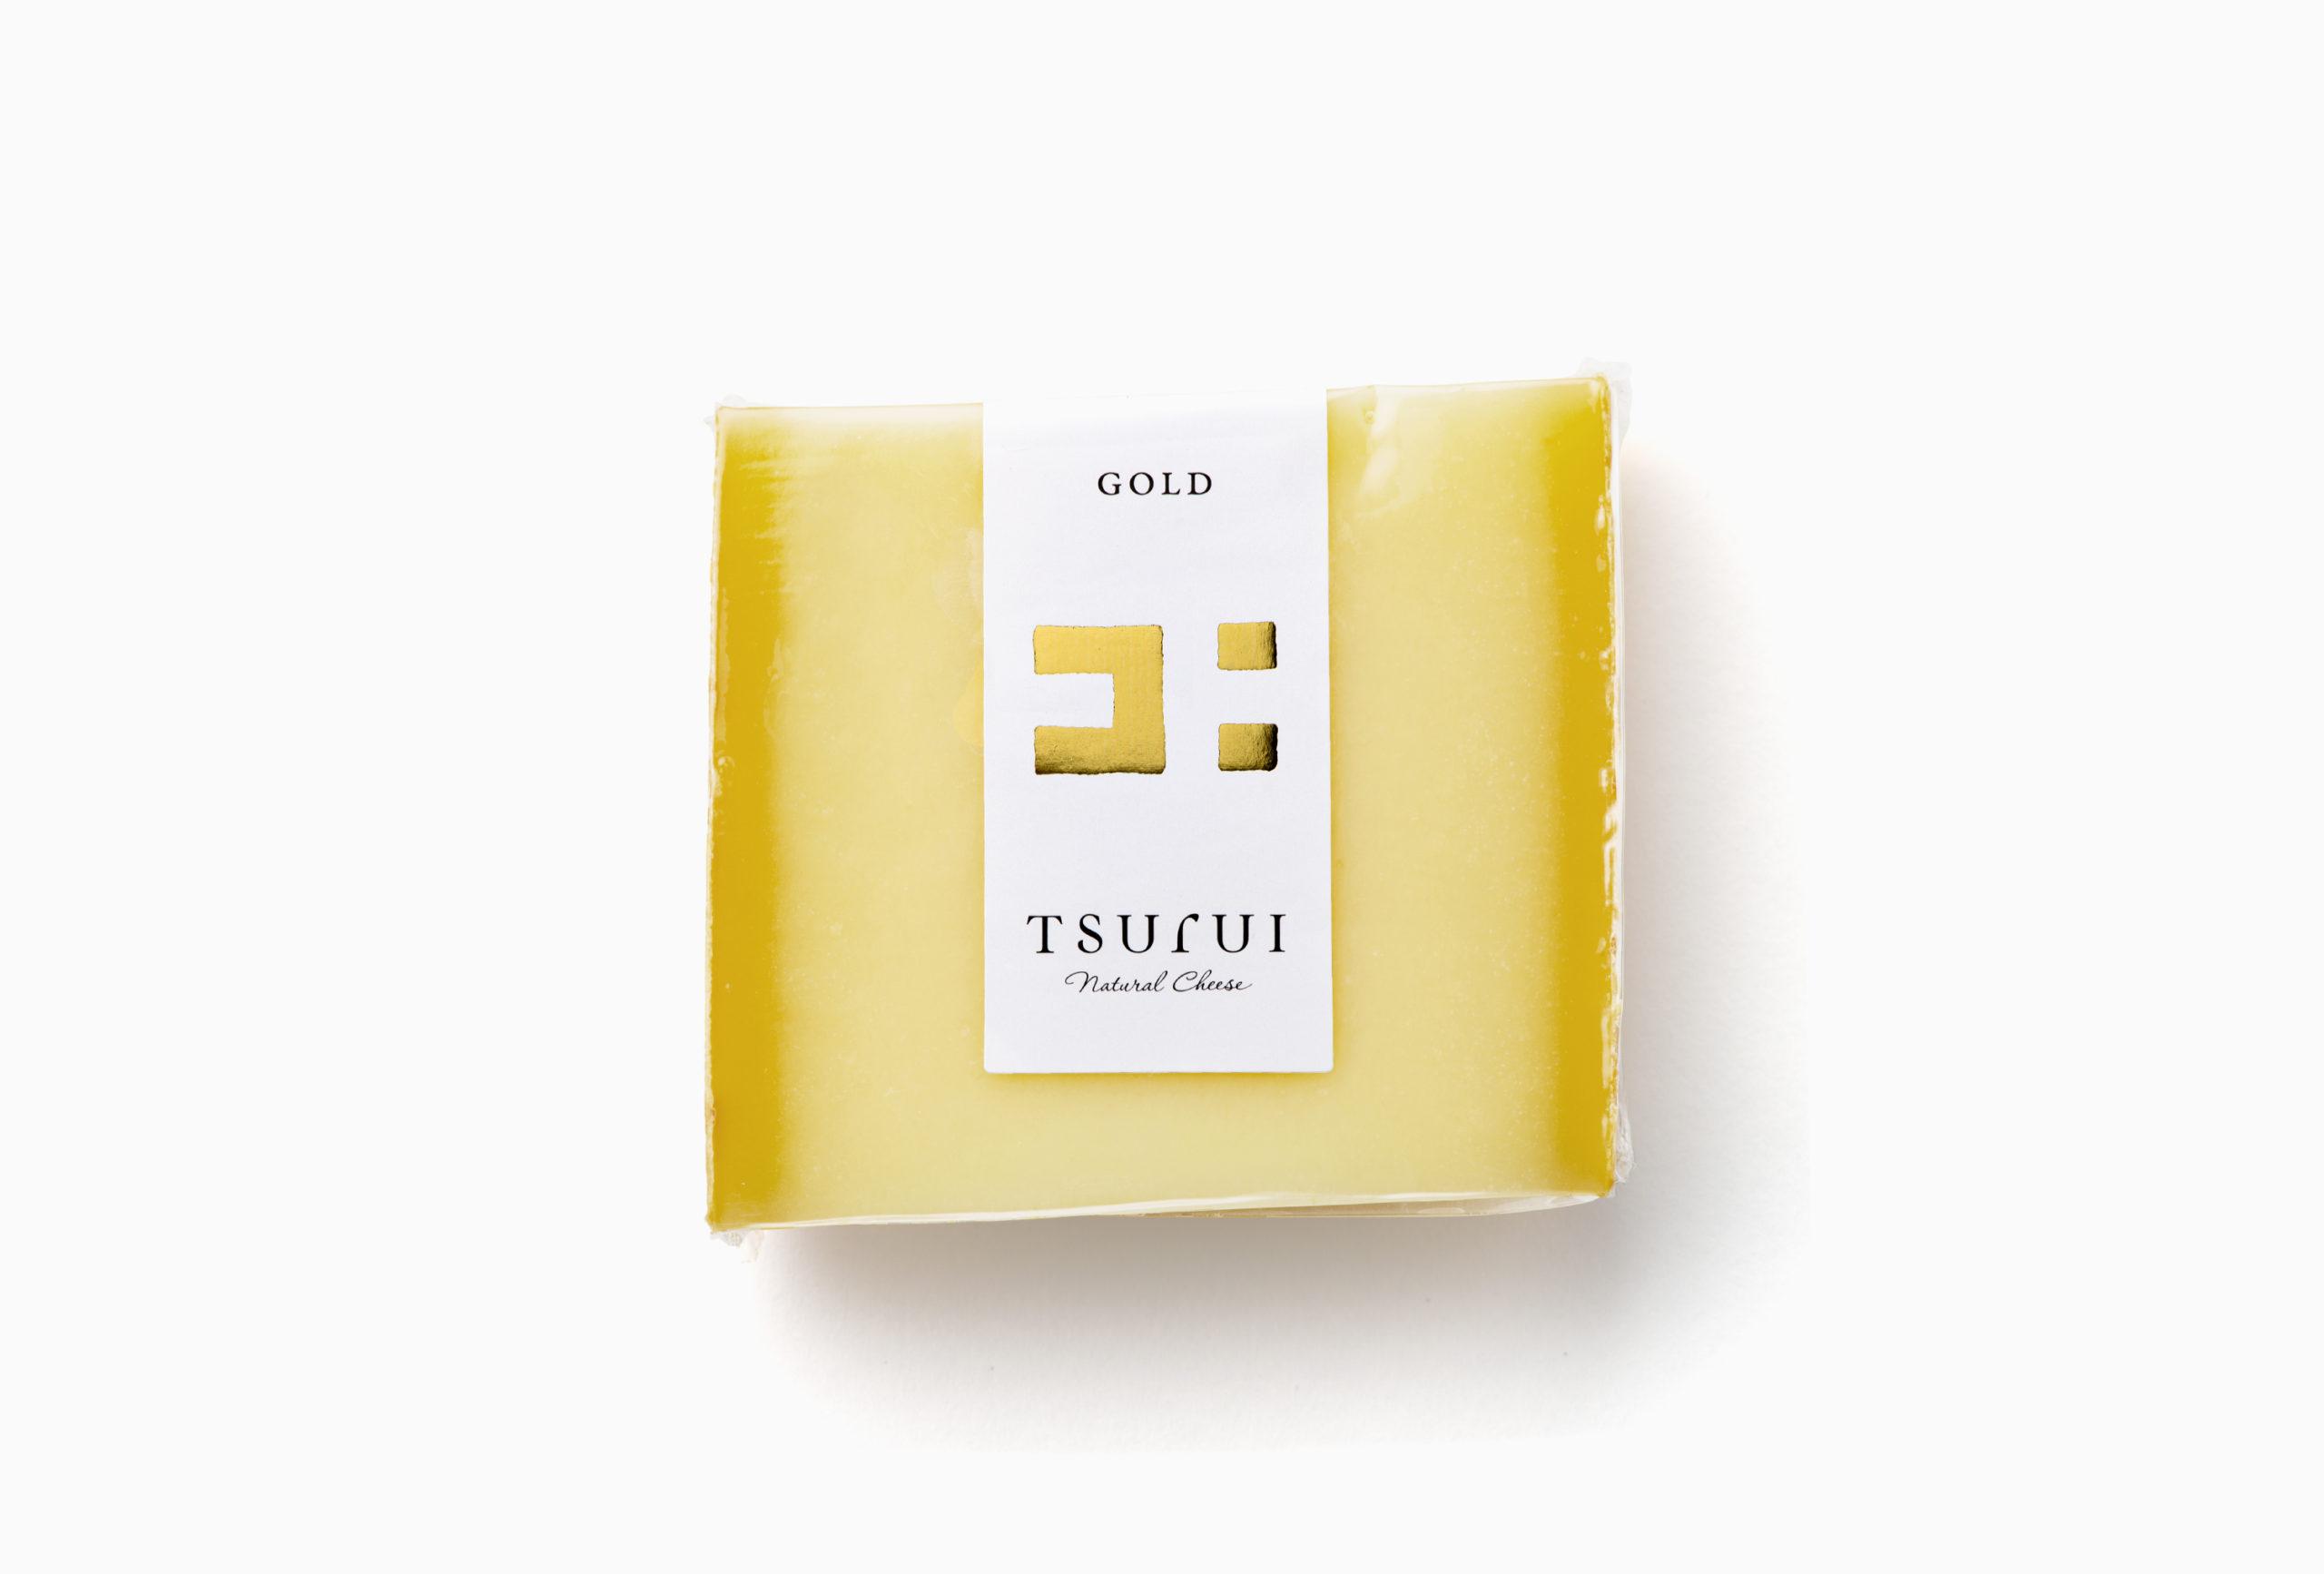 TSURUI GOLD LABEL